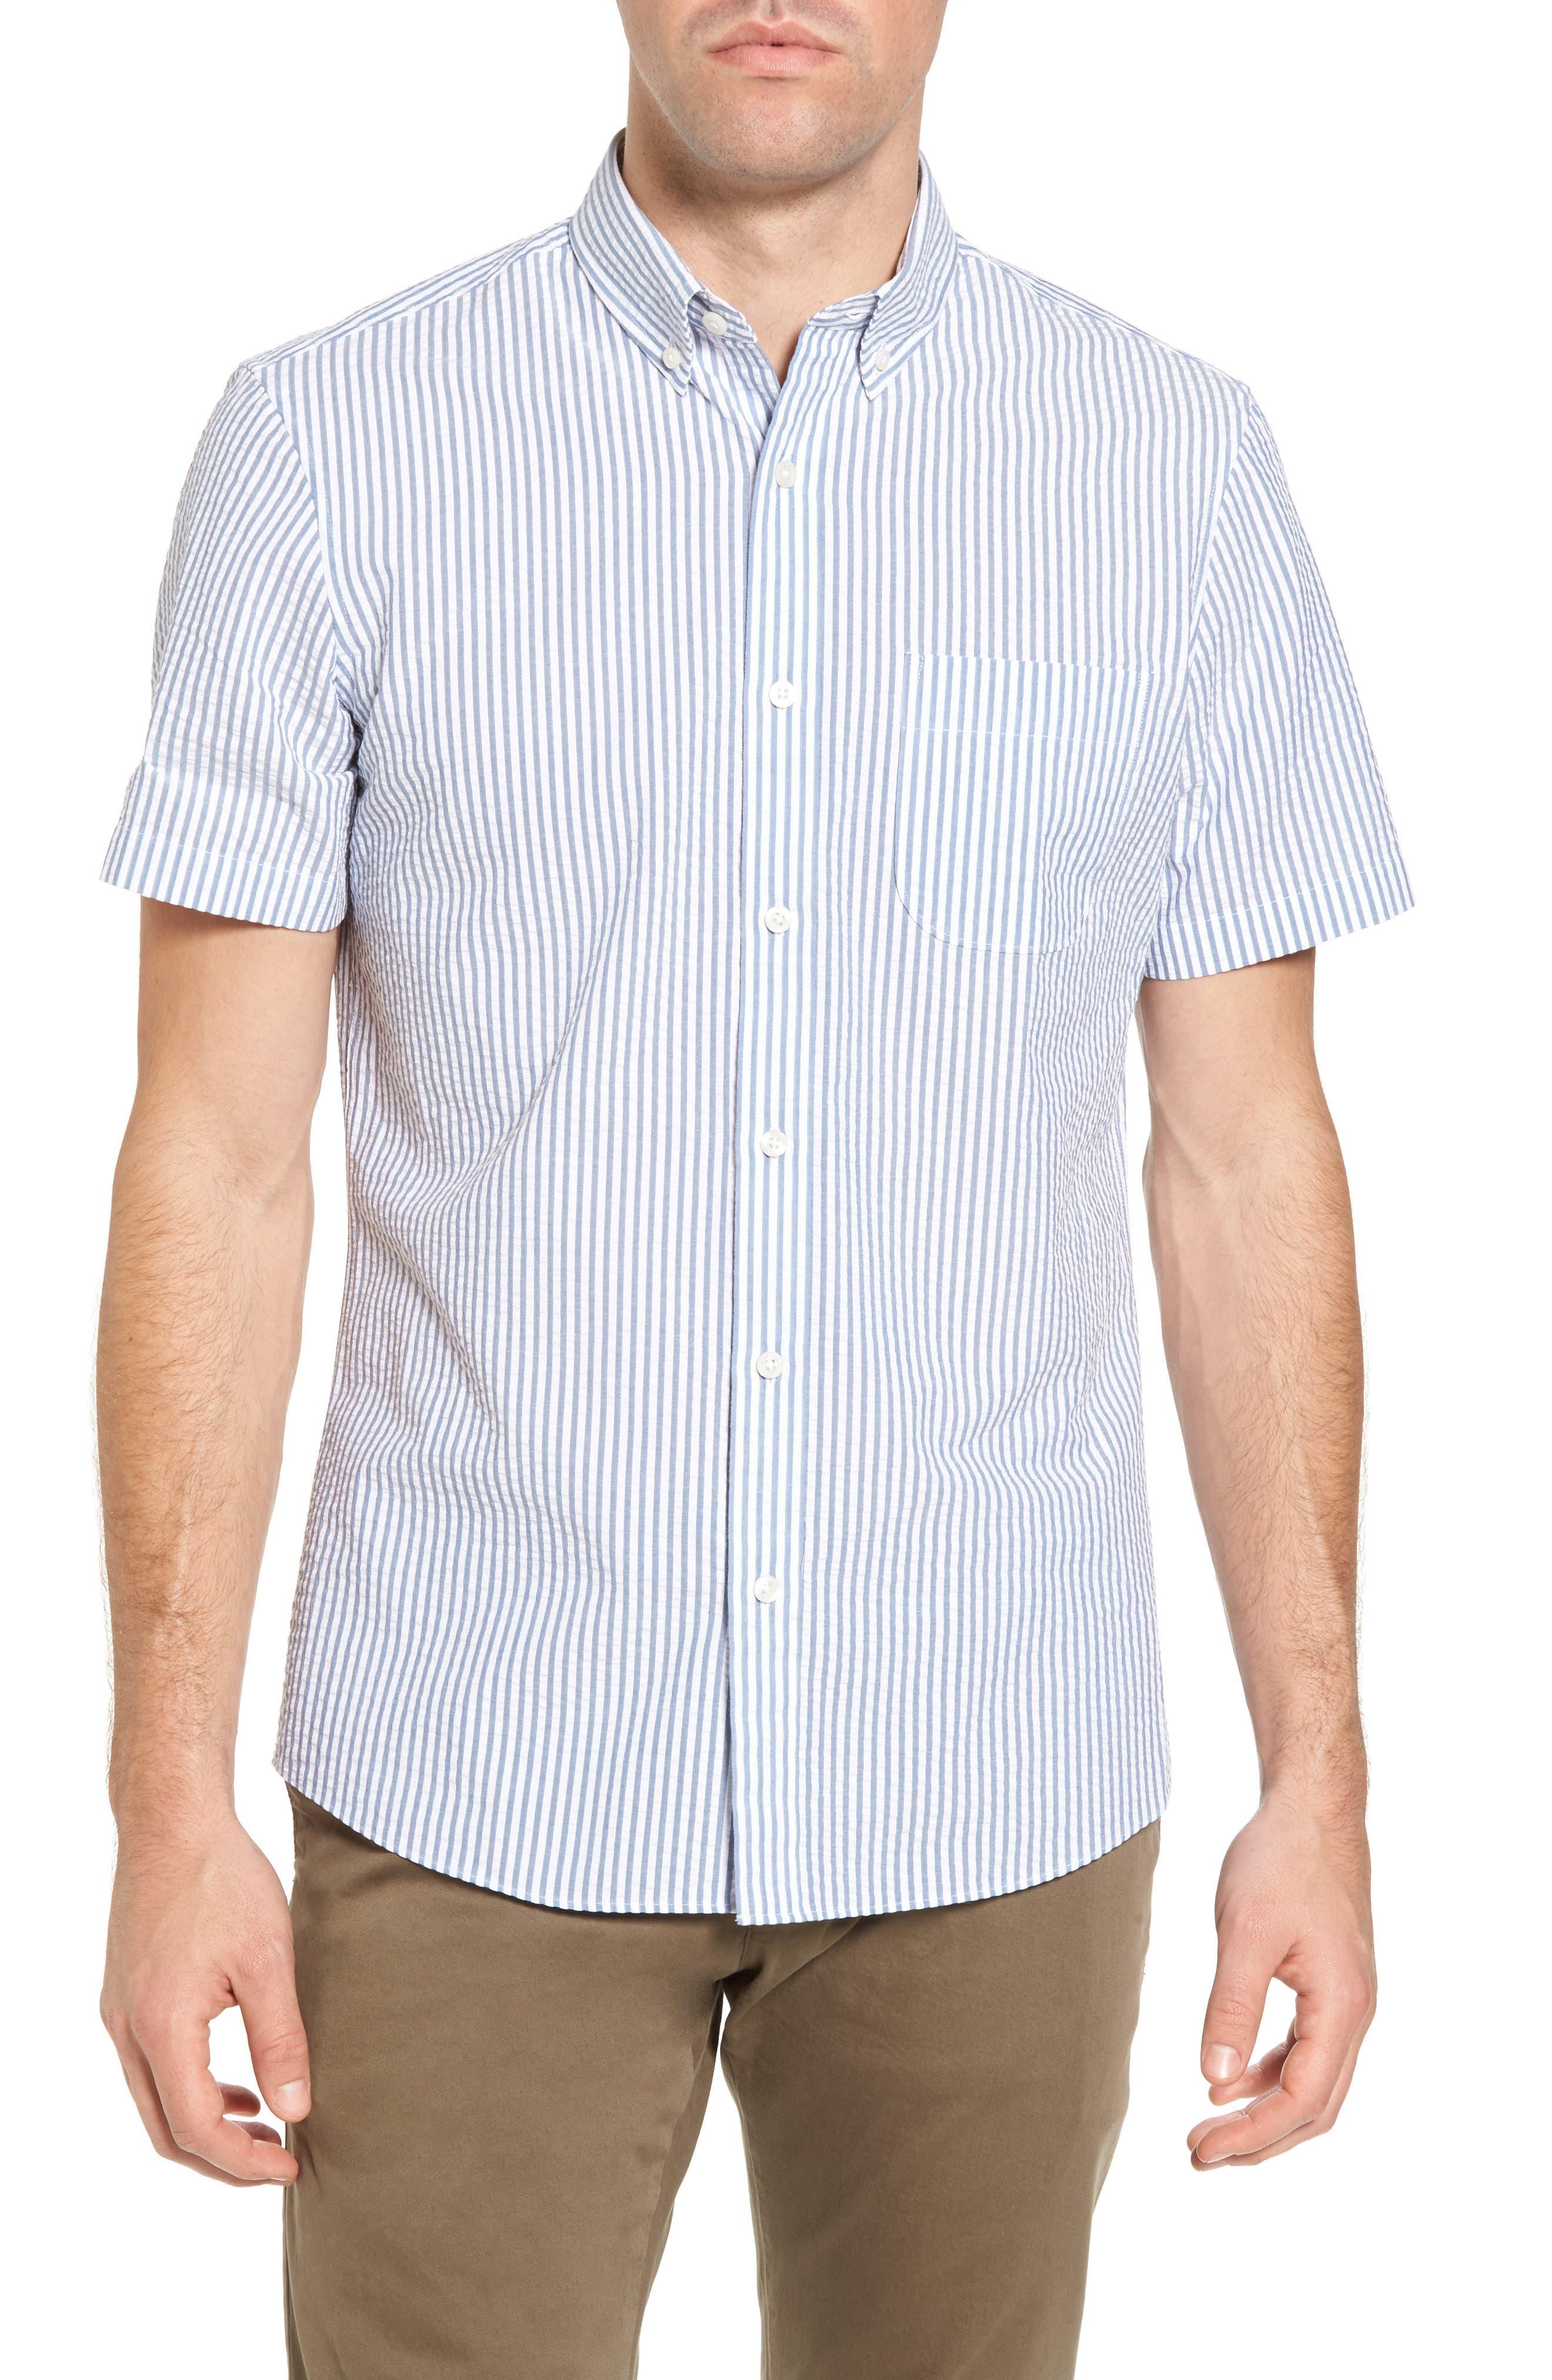 Trim Fit Seersucker Short Sleeve Sport Shirt,                             Main thumbnail 1, color,                             White Navy Seersucker Stripe